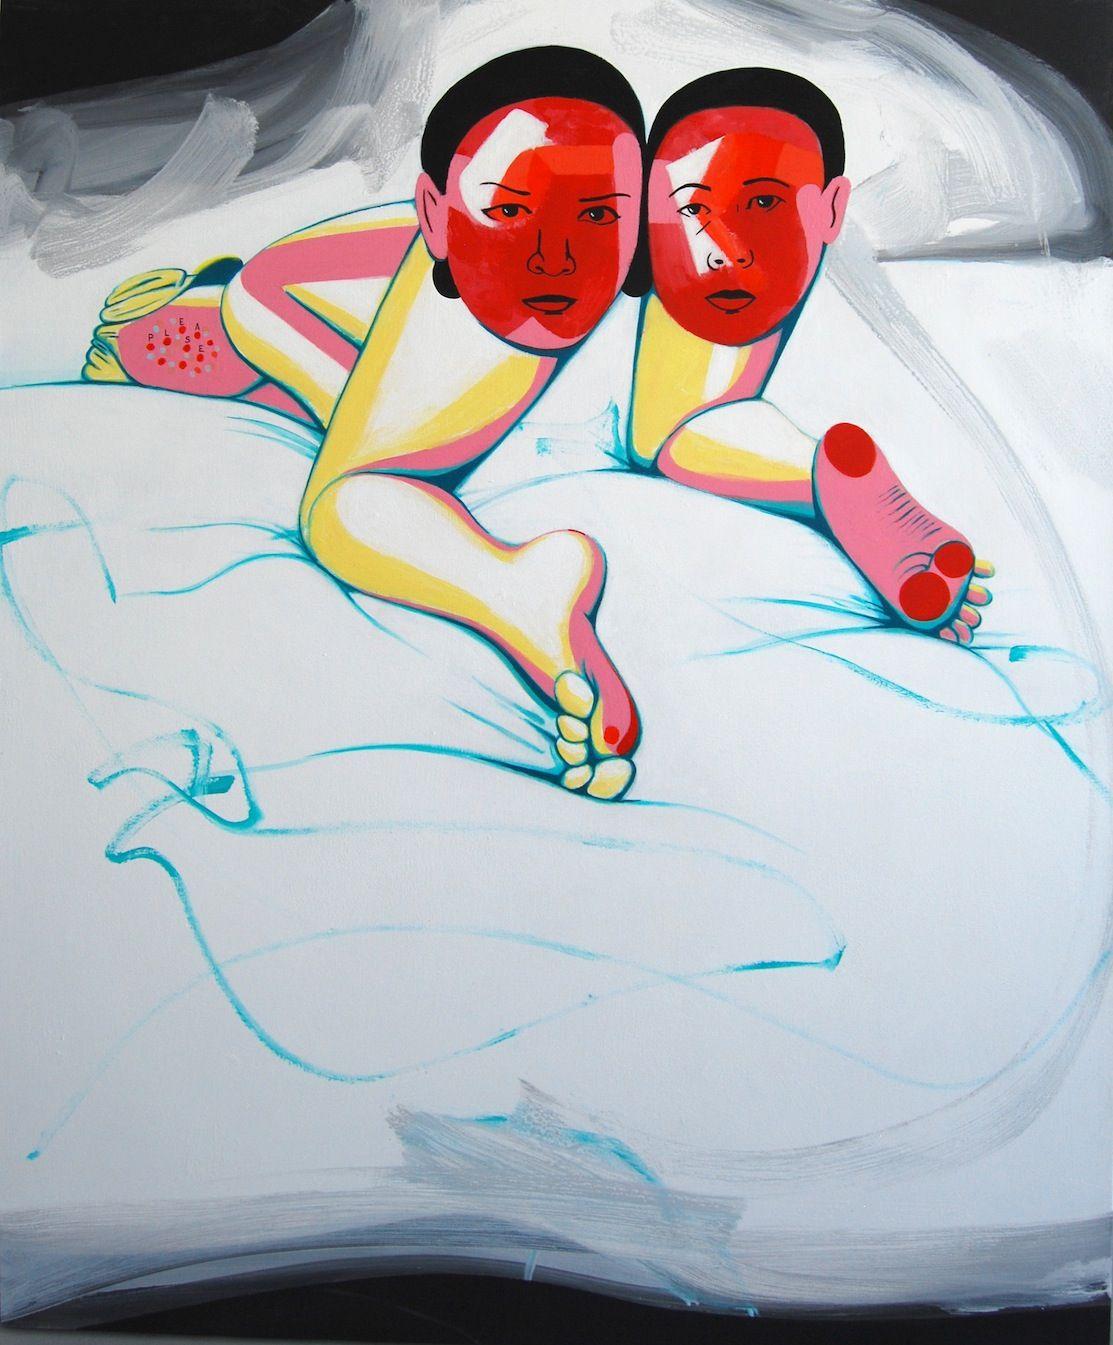 DAVID HUMPHREY, Two Mugs, 2013